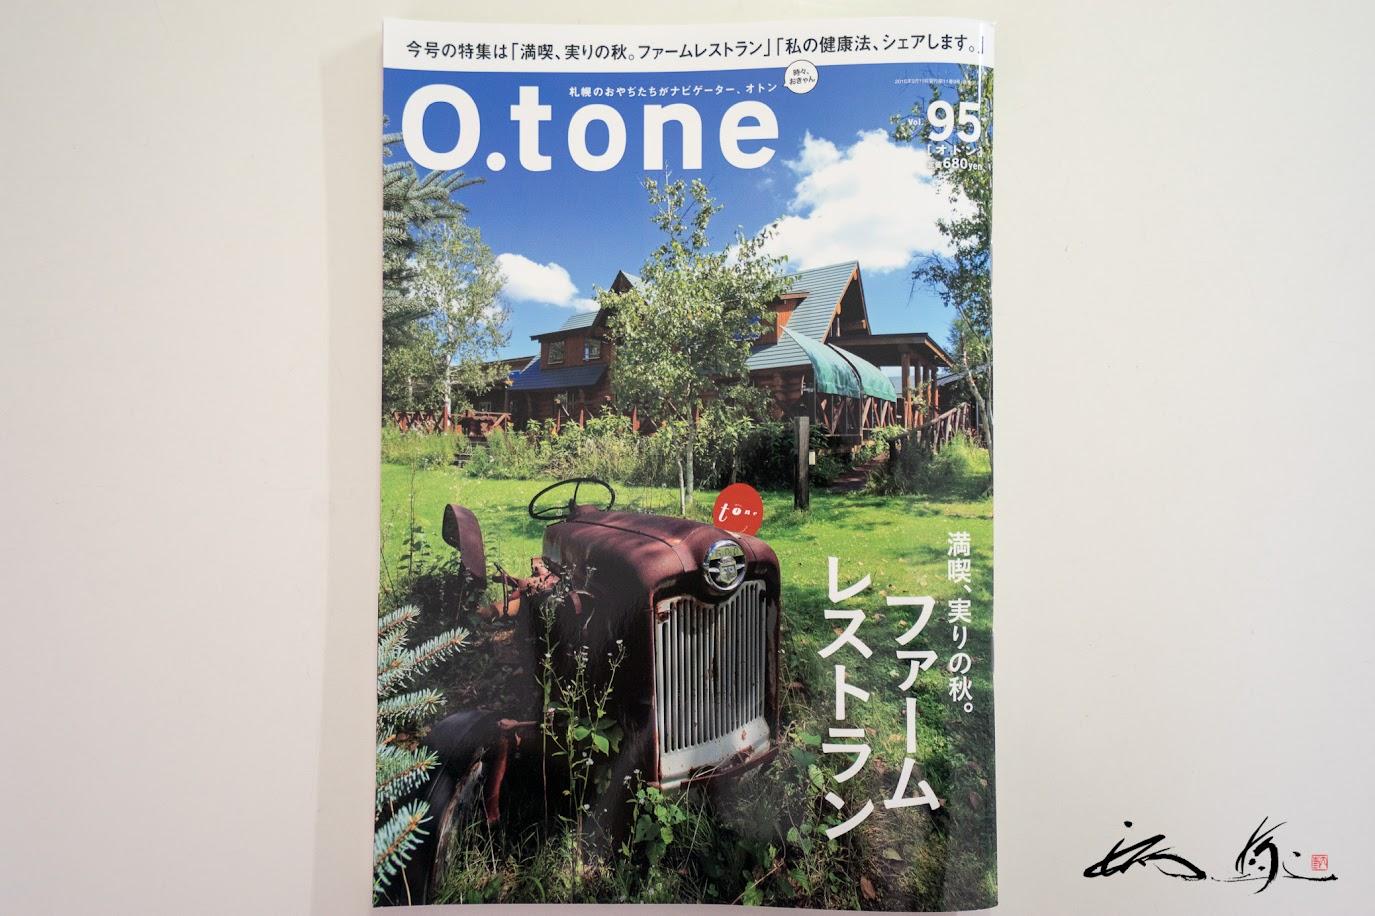 『O.tone(オトン)』Vol.95(2016年9月15日発行)